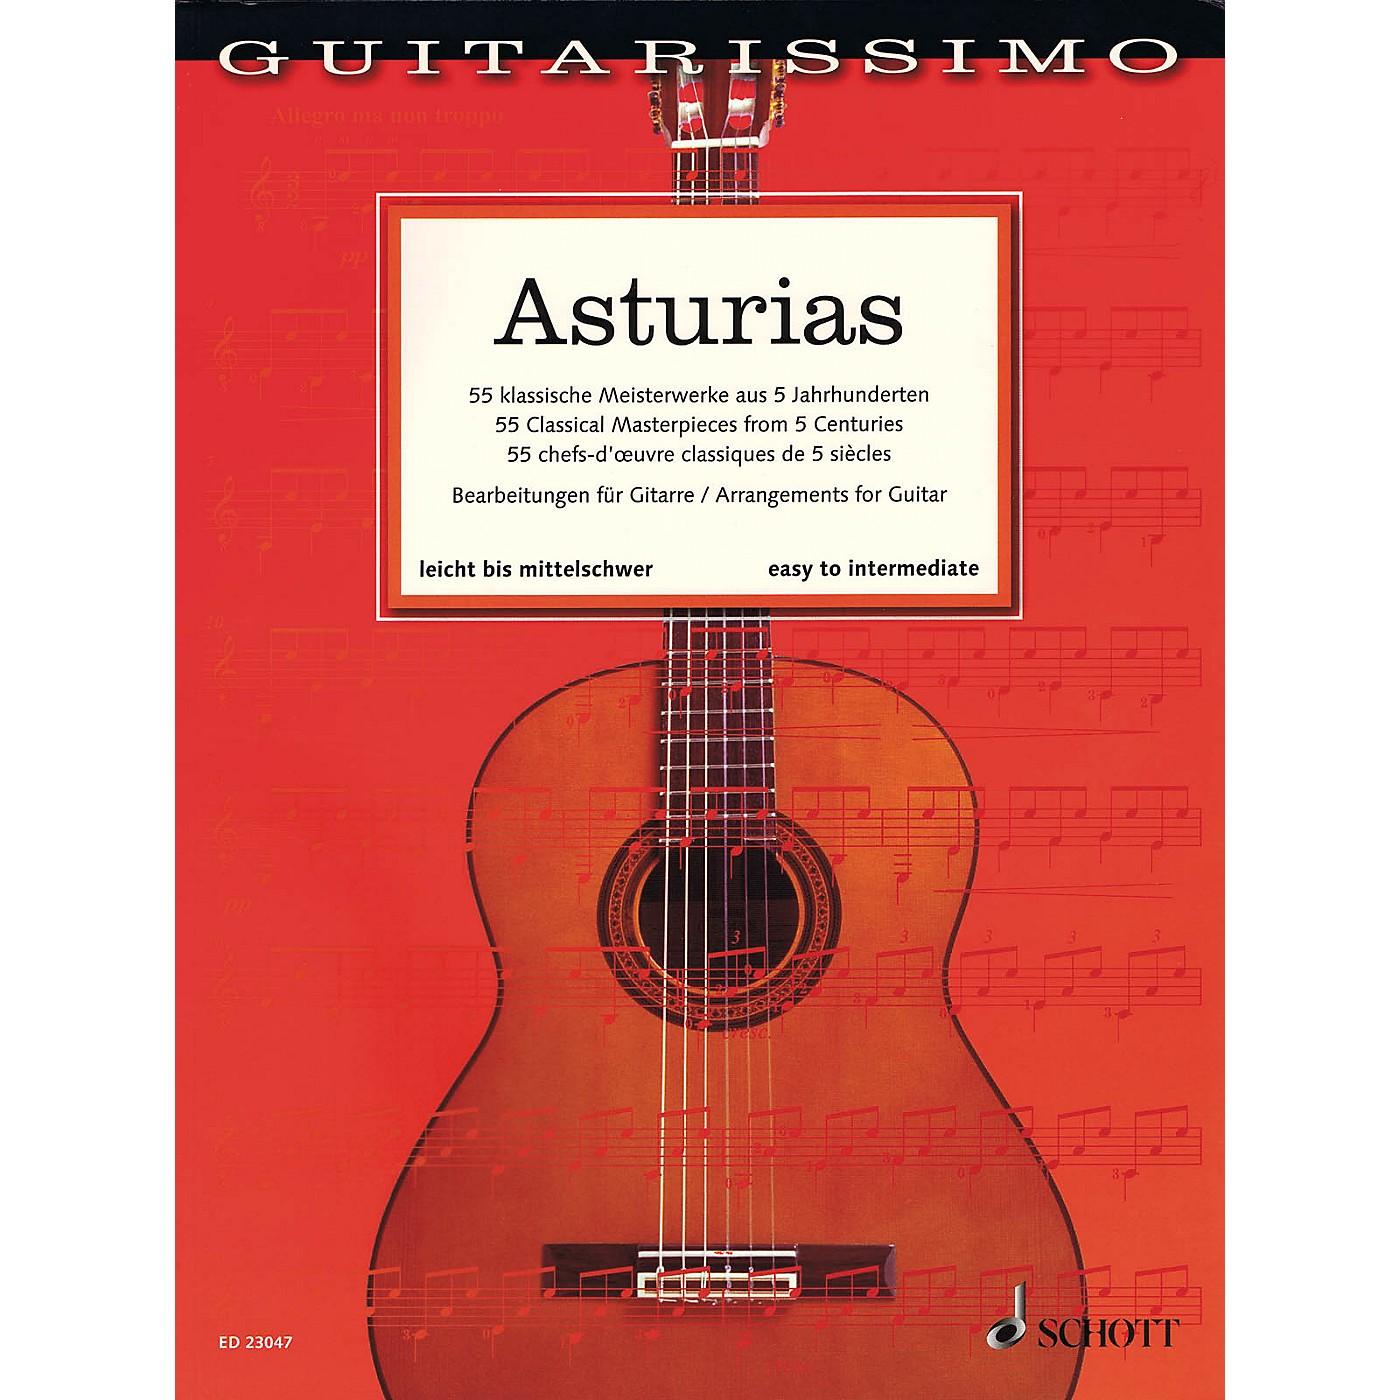 Schott Asturias (55 Classical Masterpieces from 5 Centuries Guitar) Guitar Songbook thumbnail